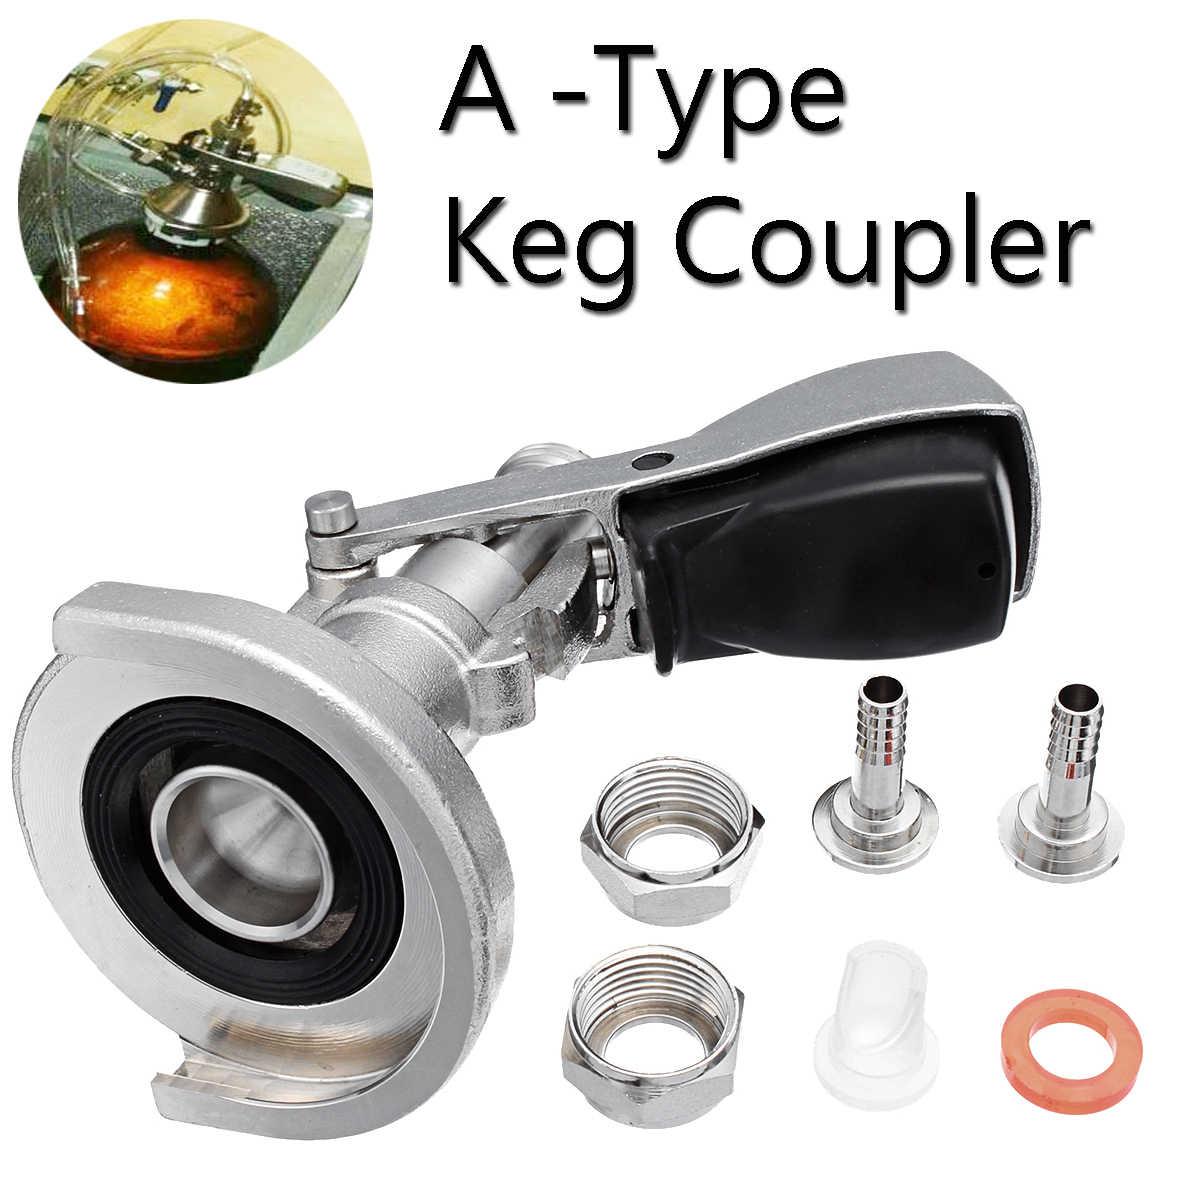 A-type Keg Coupler Draft Beer Dispenser For Home Brew Connectors Coupler Head For Home brew Wine Beer Dispenser